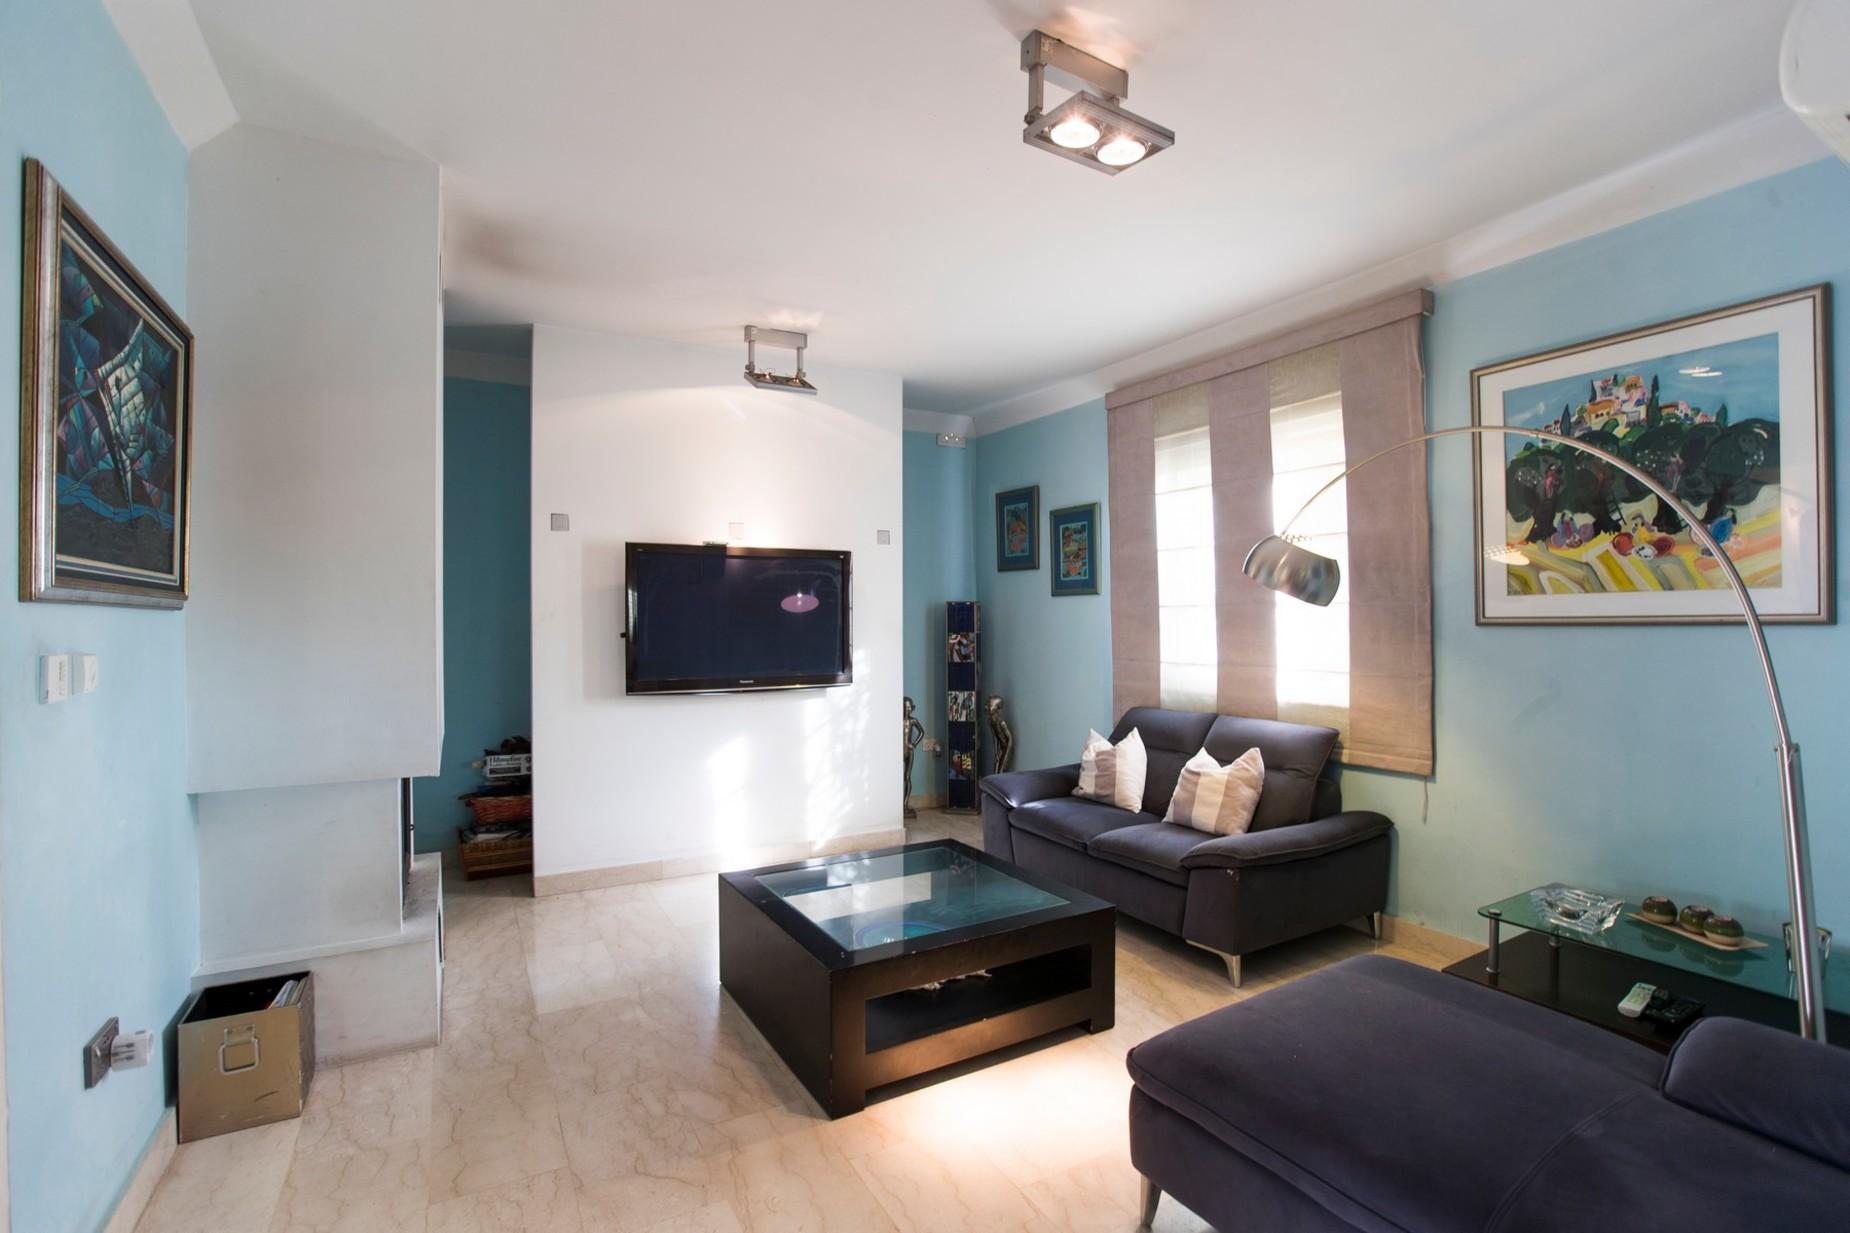 4 bed Villa For Rent in Naxxar, Naxxar - thumb 20